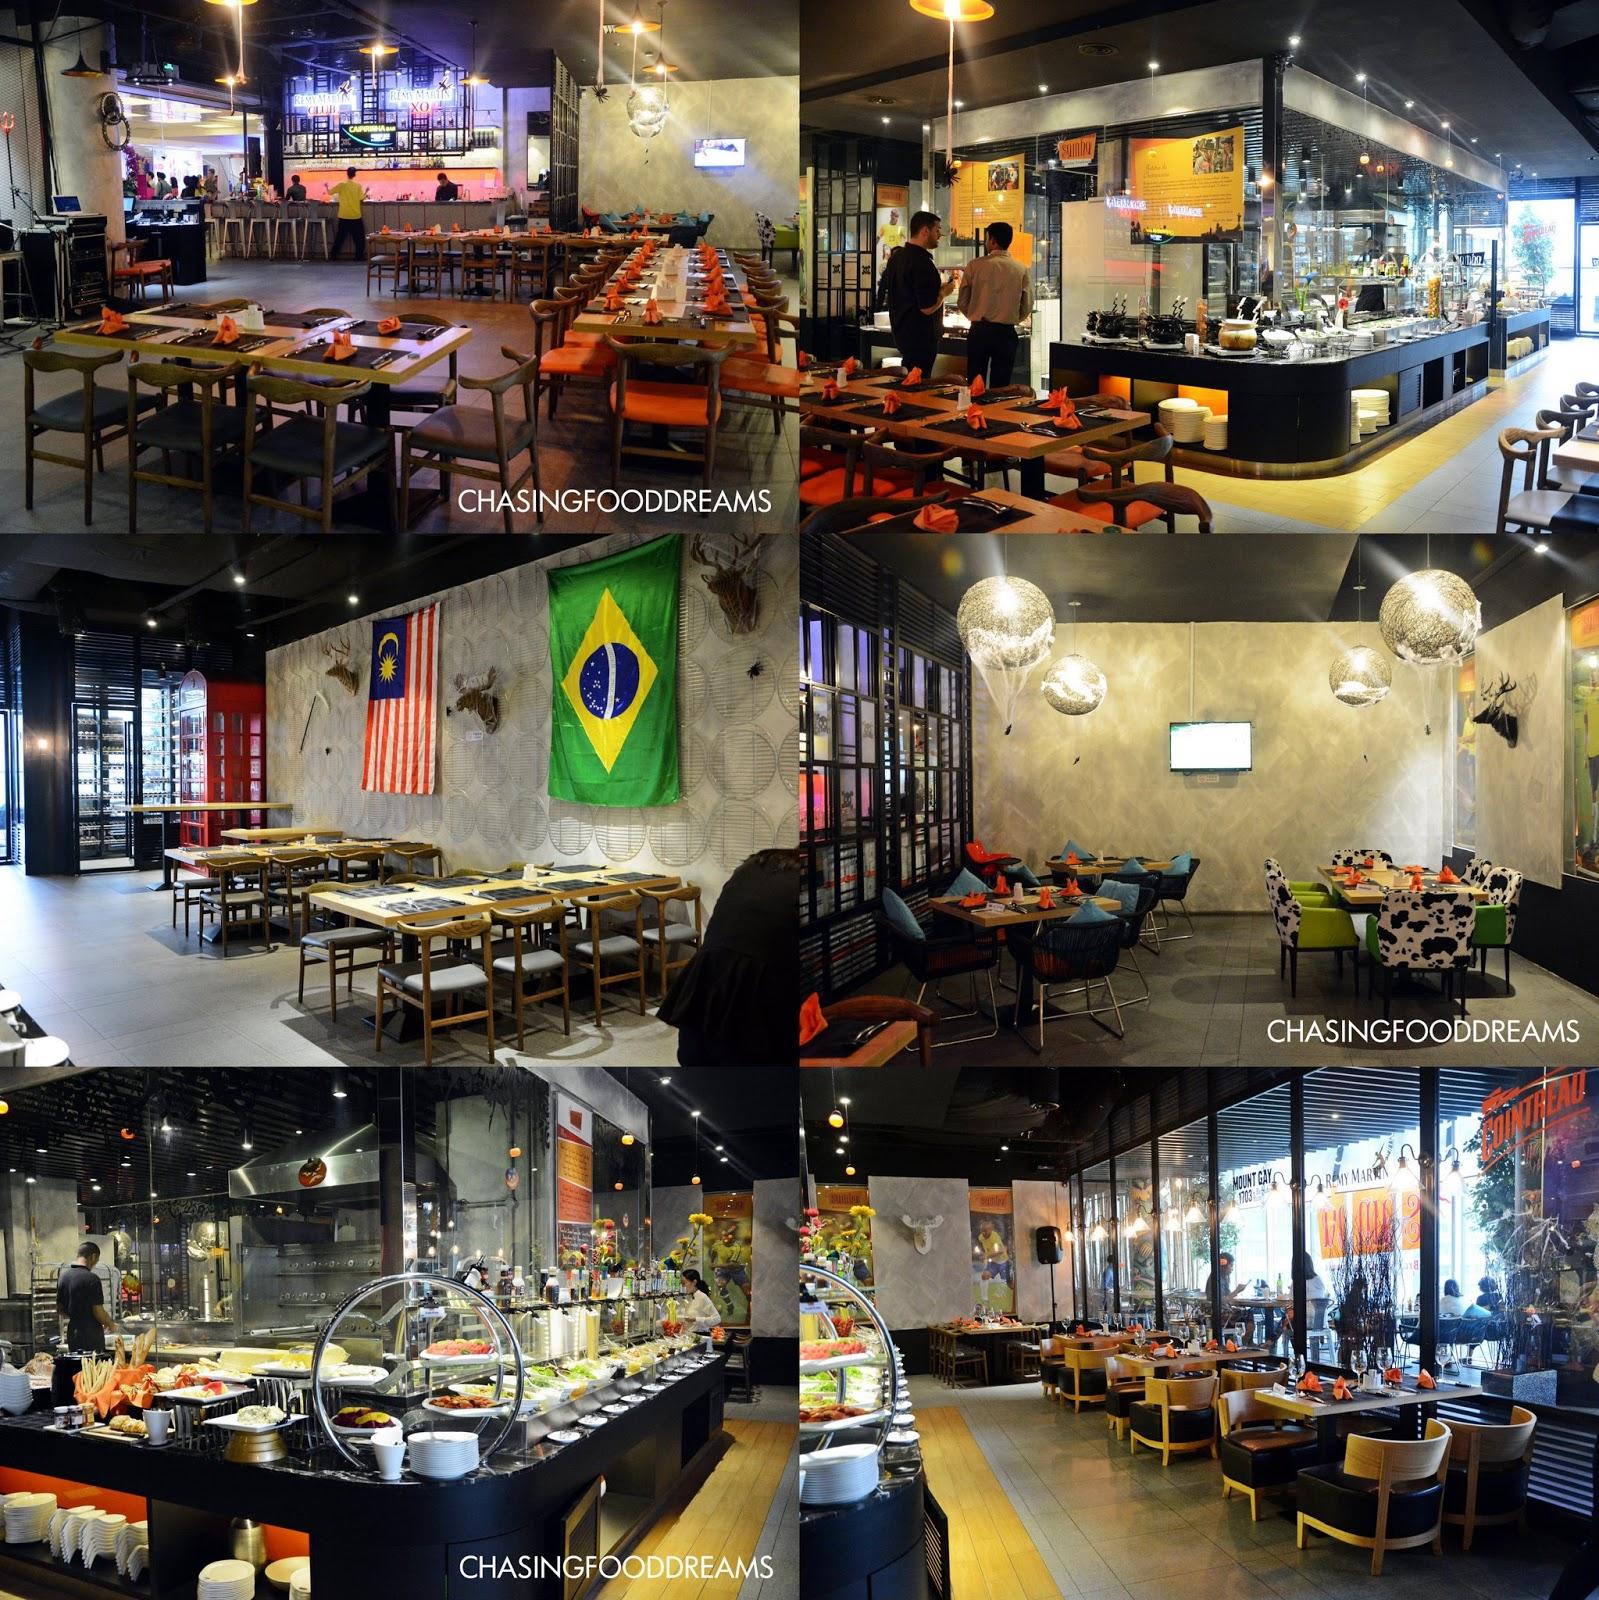 CHASING FOOD DREAMS Samba Brazilian Steak House Churrascaria Avenue K A Fabulous Churrasco